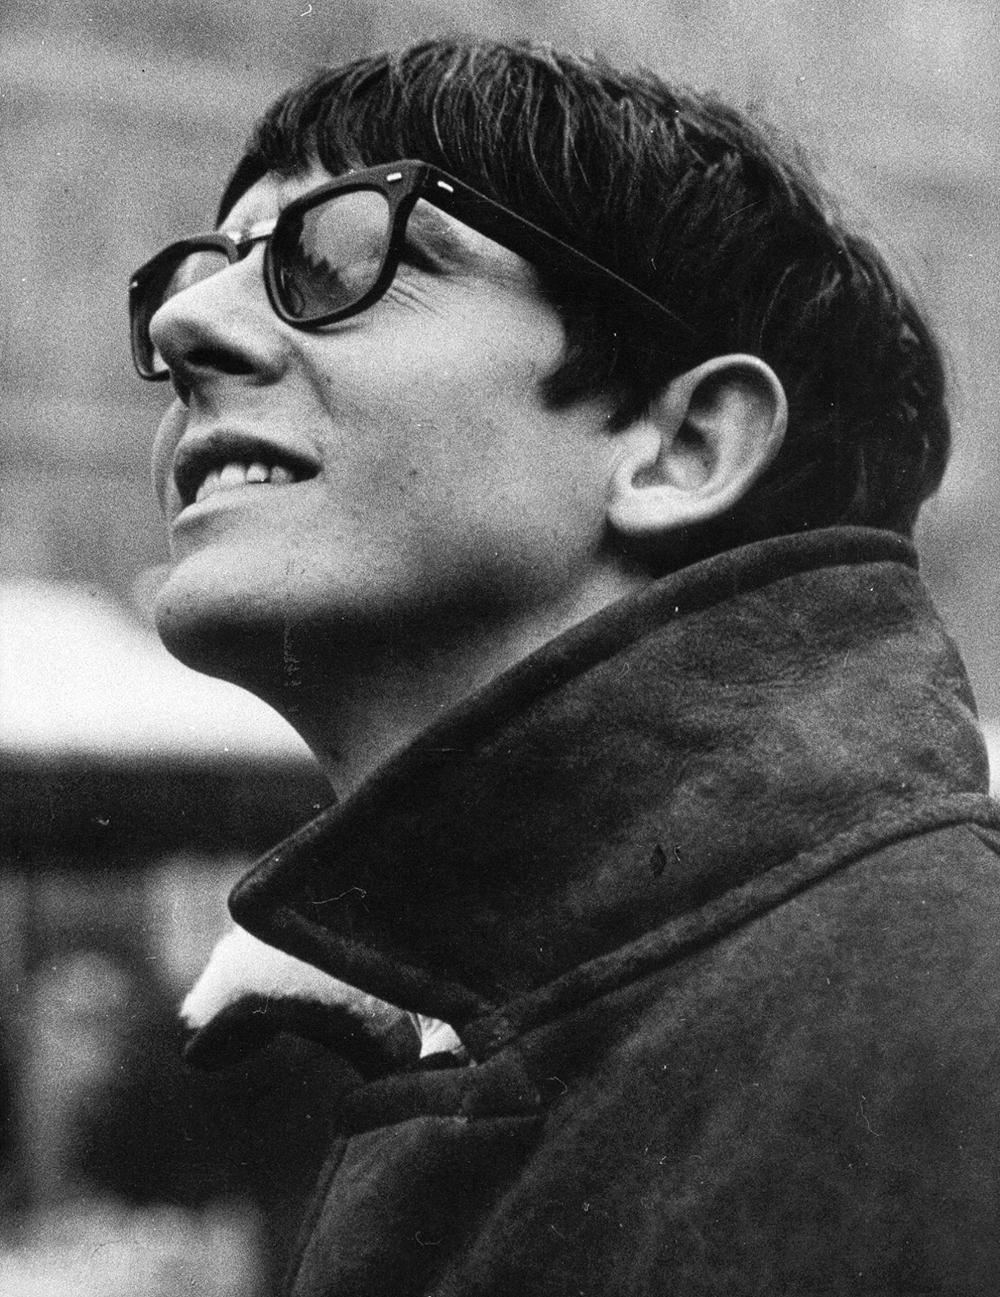 Peter Handke 1967